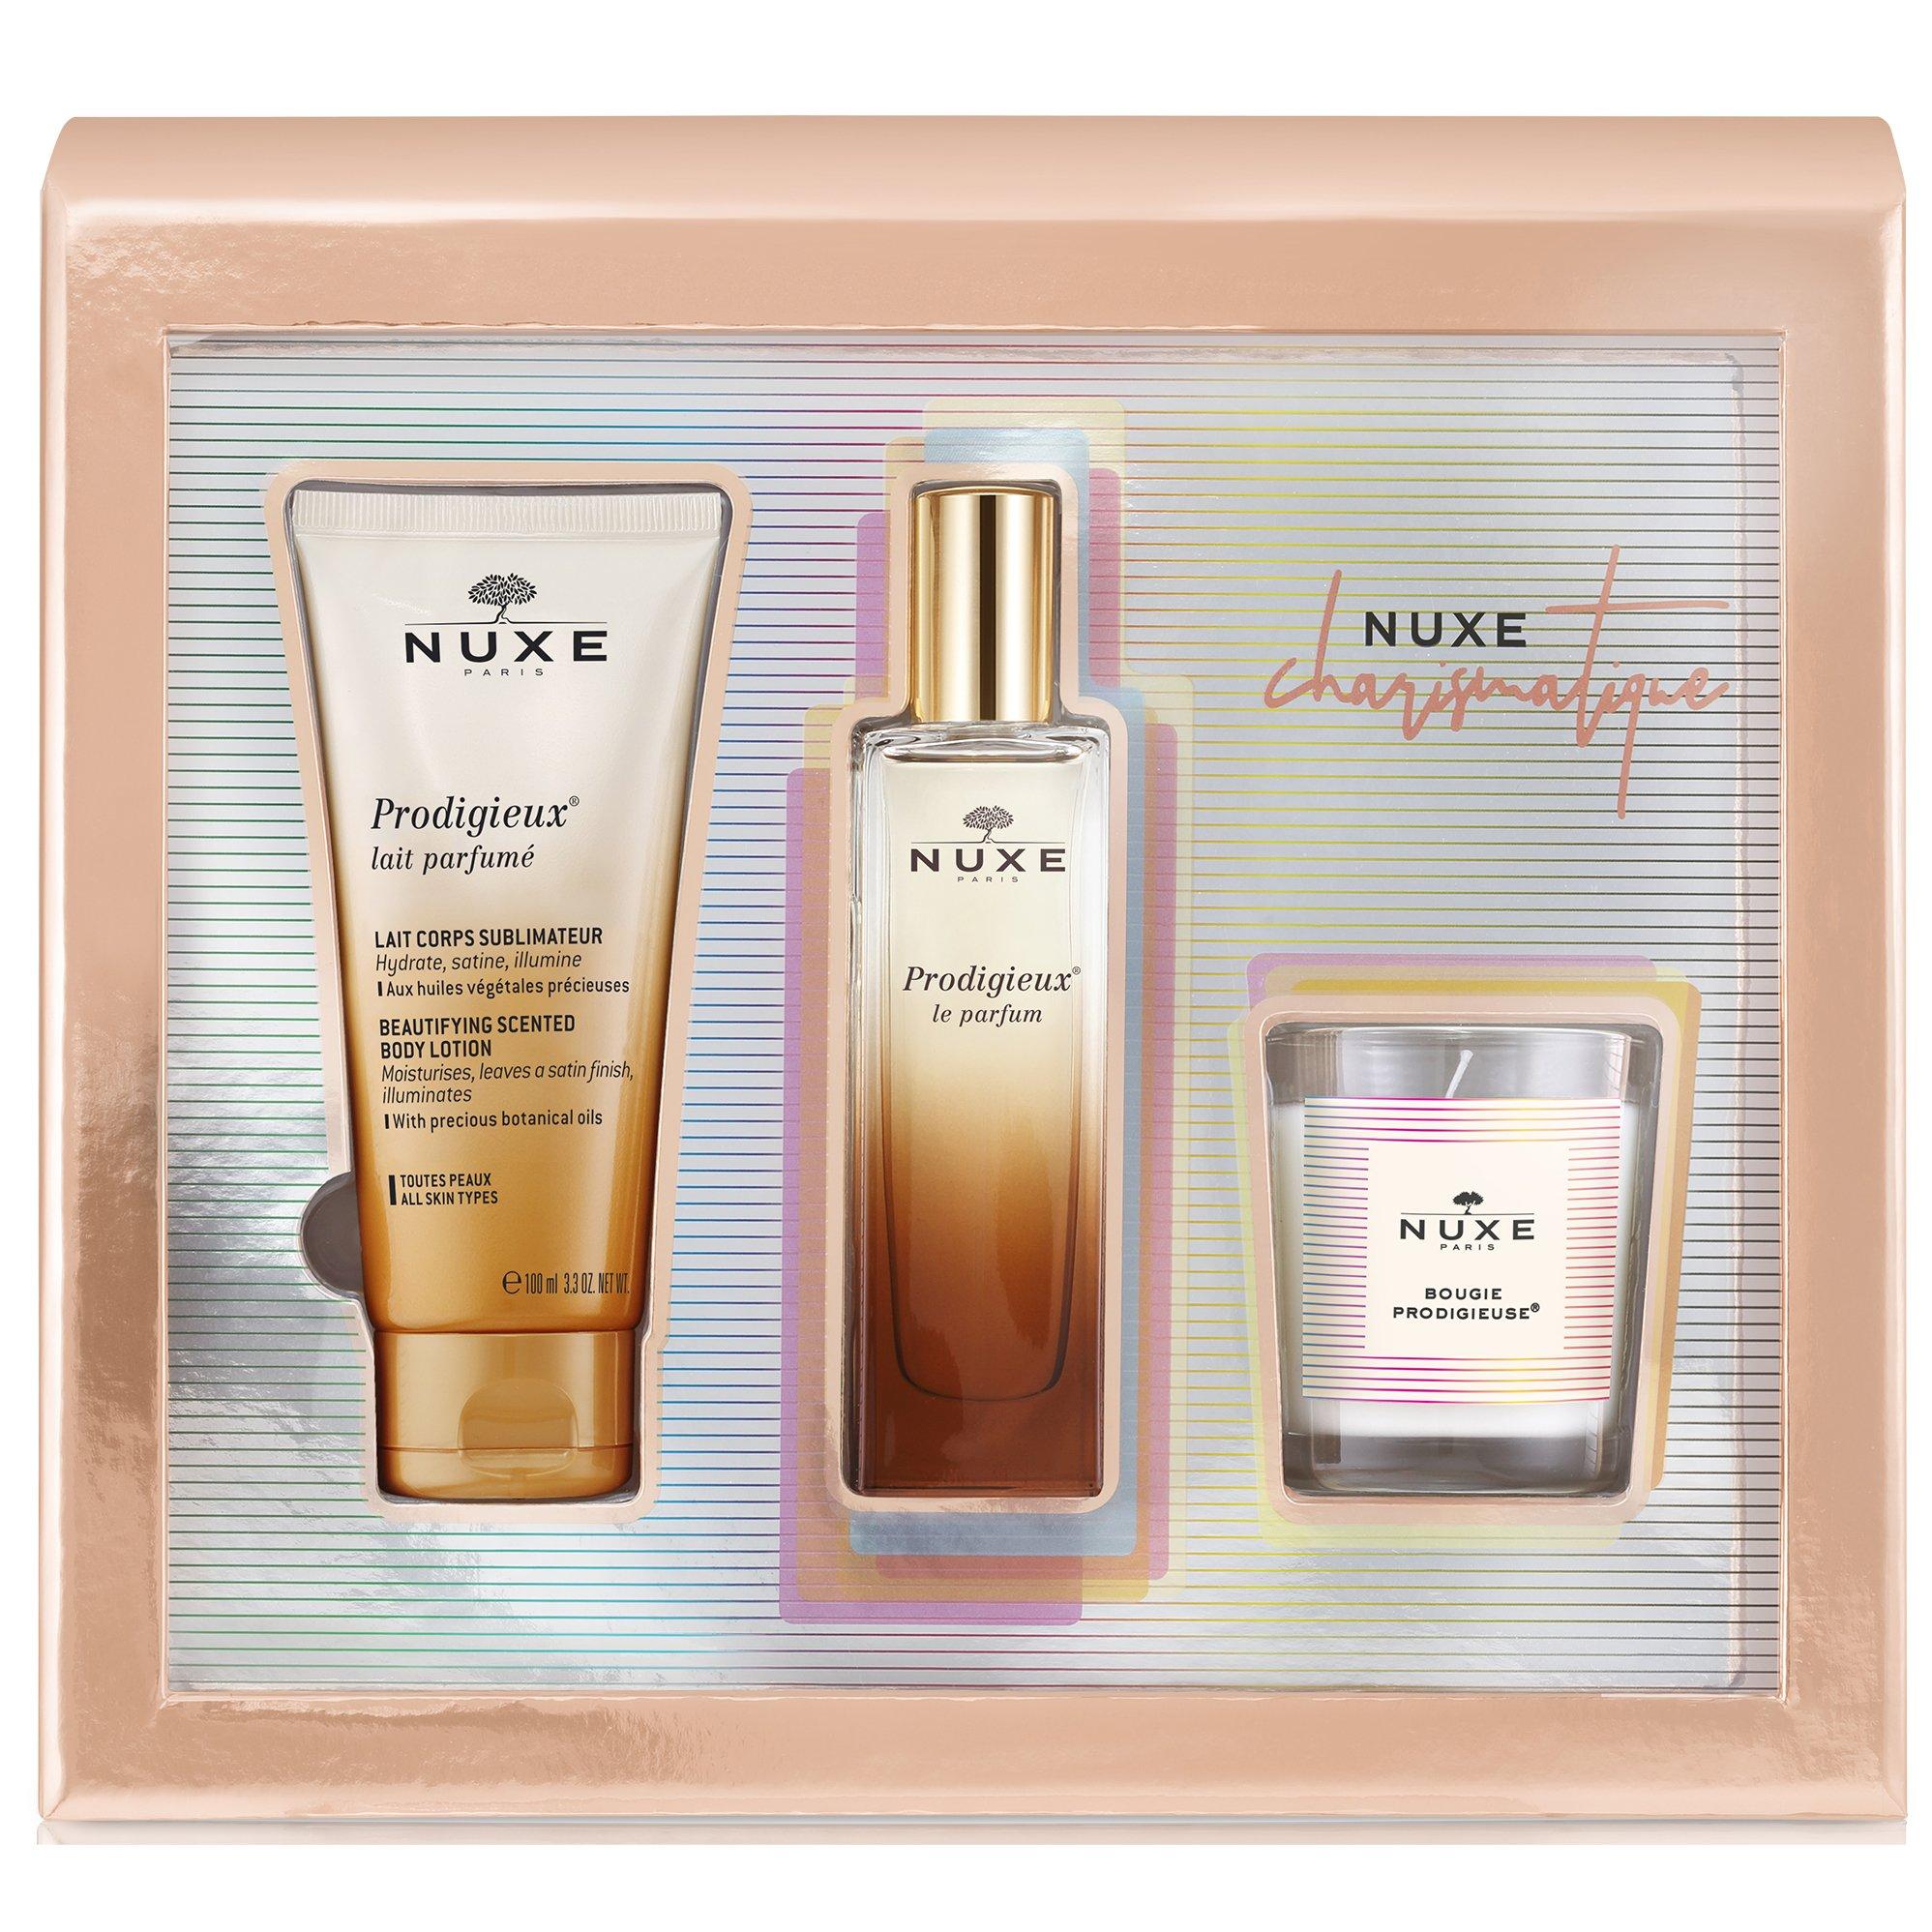 Nuxe Promo Charismatique Prodigieux Le Parfum Άρωμα 50ml & Body Lotion Αρωματικό Γαλάκτωμα 100ml & Bougie Prodigieuse Κερί 70gr